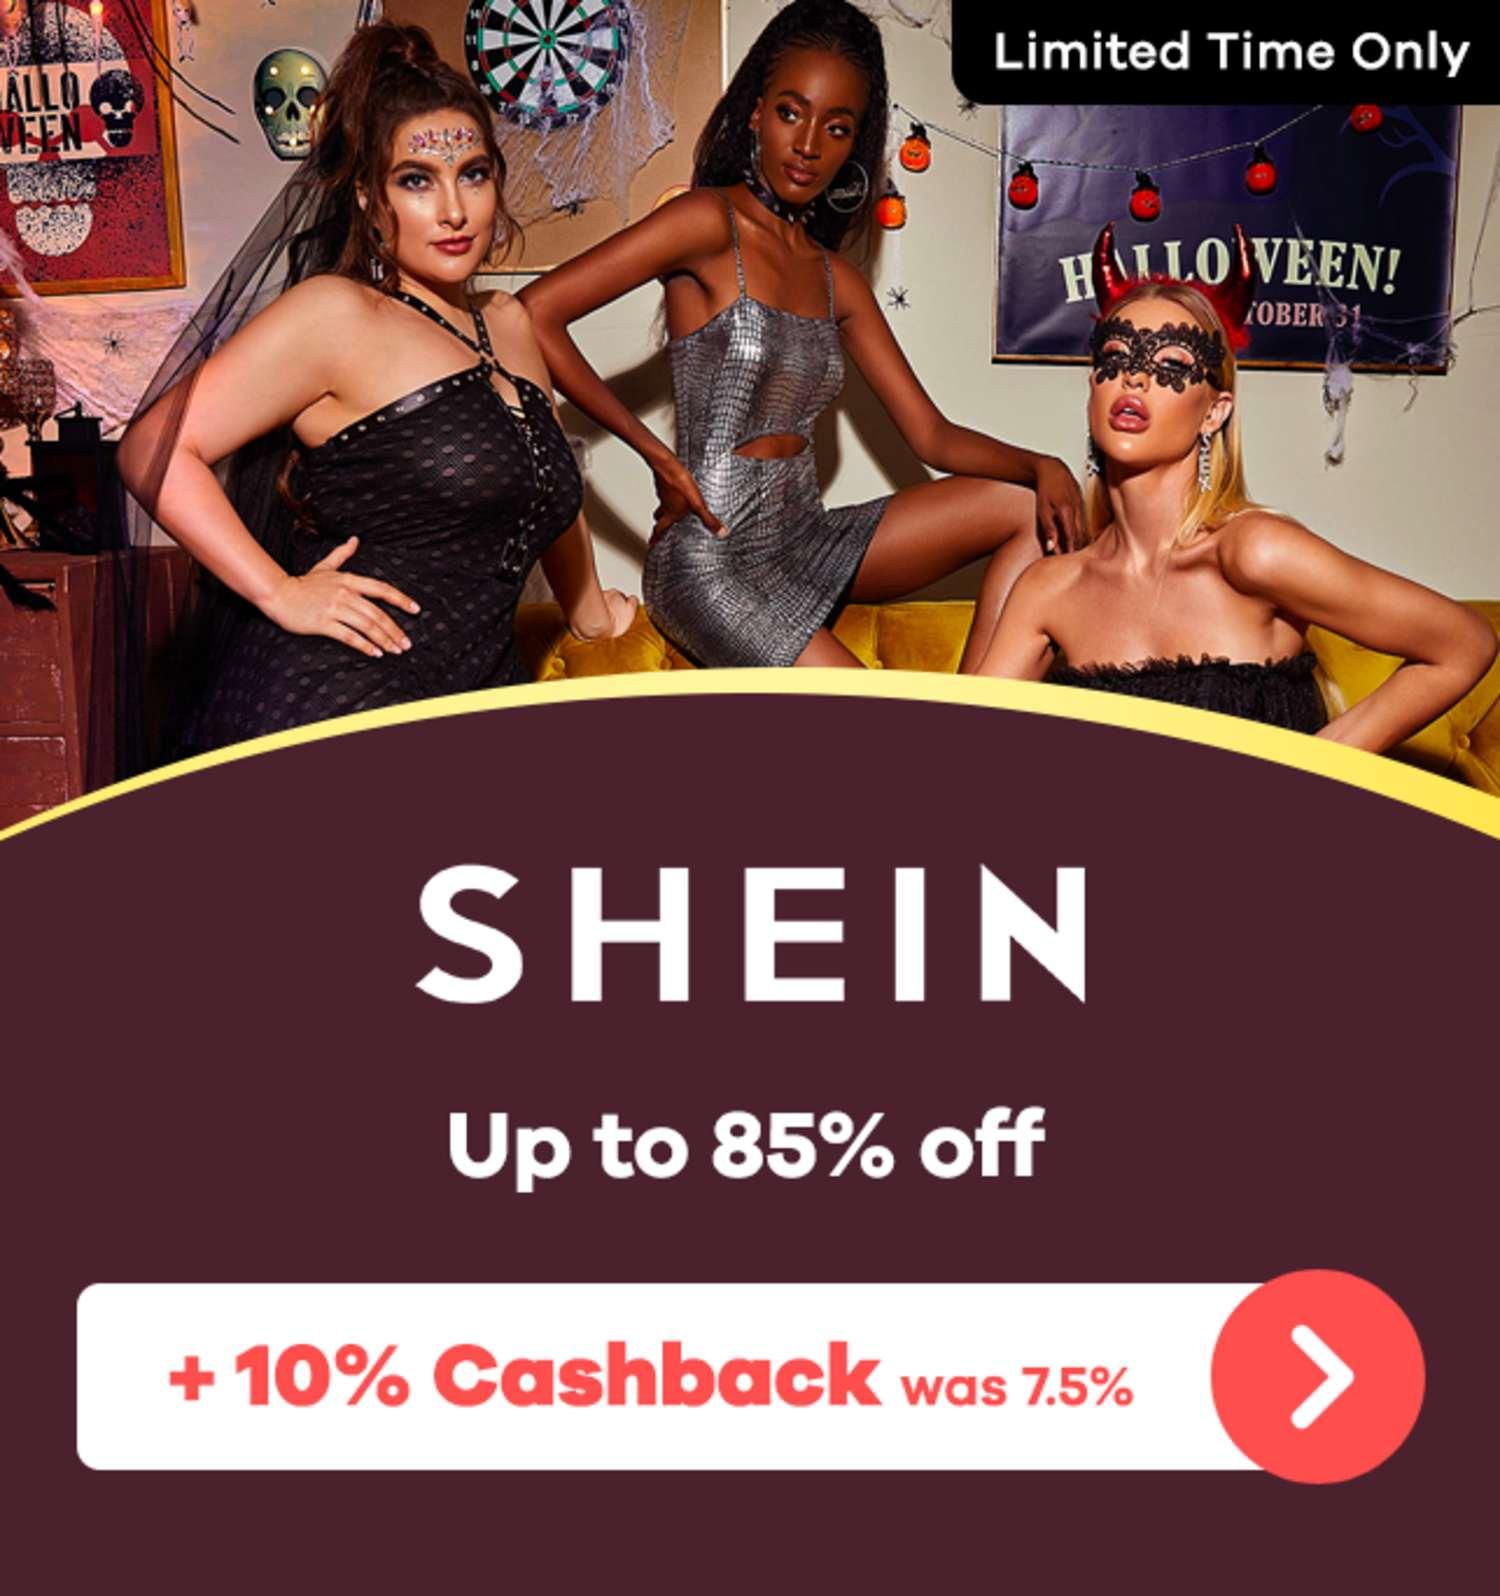 SHEIN - 10% Upsized Cashback (September 2020)